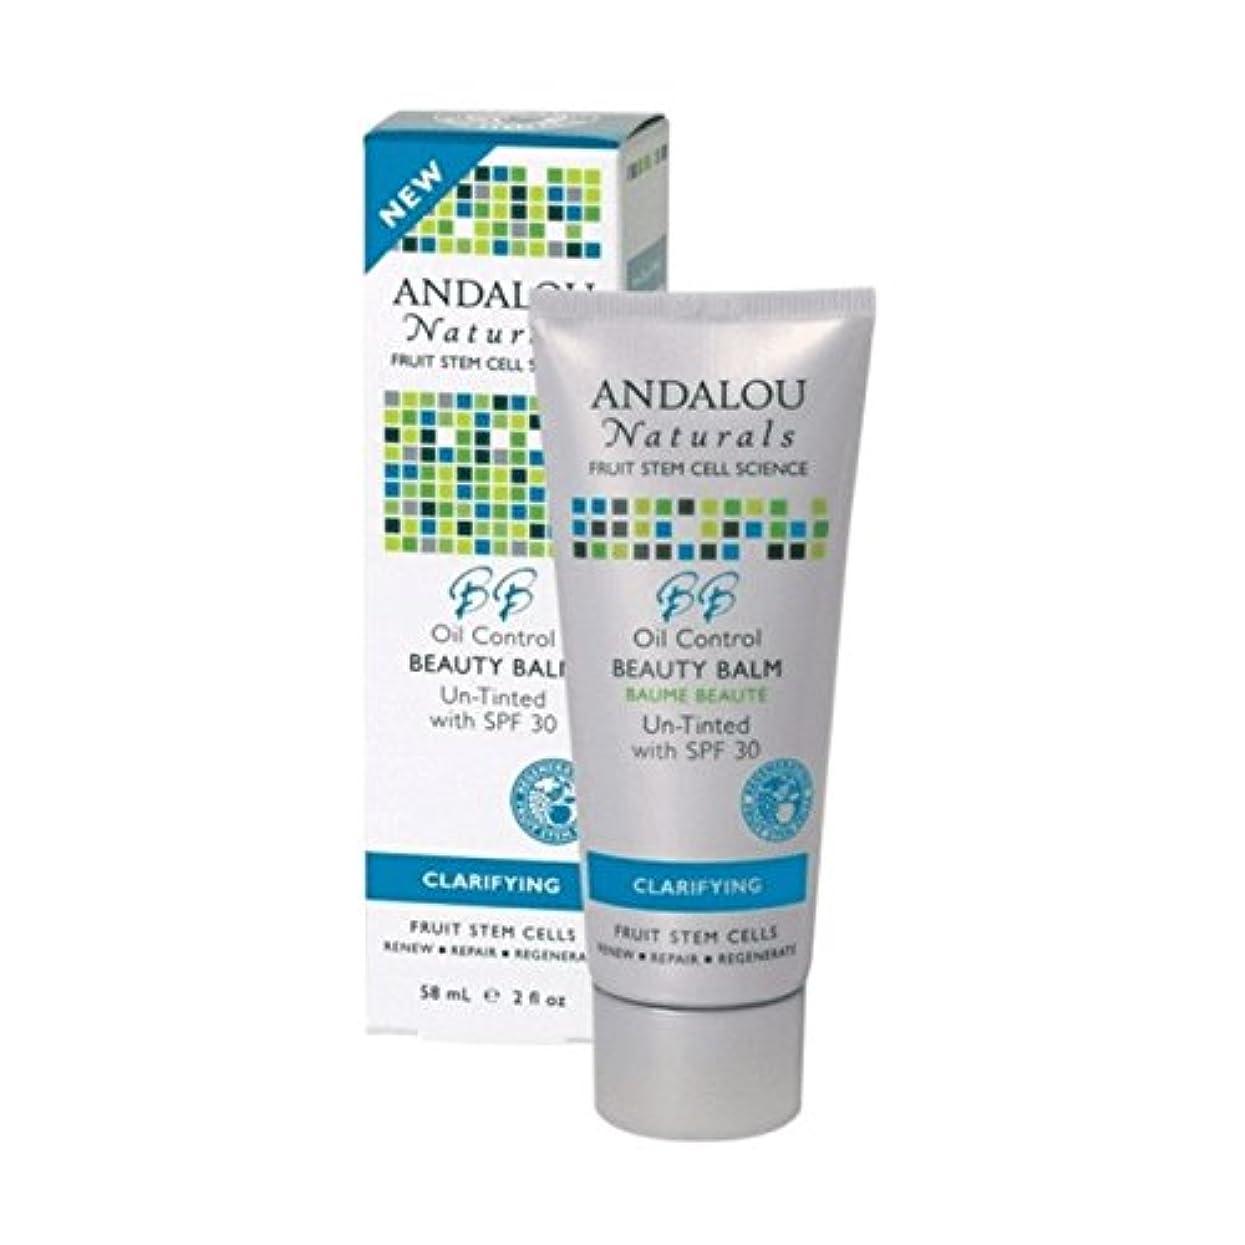 Andalou Oil Control Beauty Balm Un-Tinted SPF 30 58ml (Pack of 2) - アンダロウオイルコントロール美容バーム未着色Spf 30 58ミリリットル (x2)...